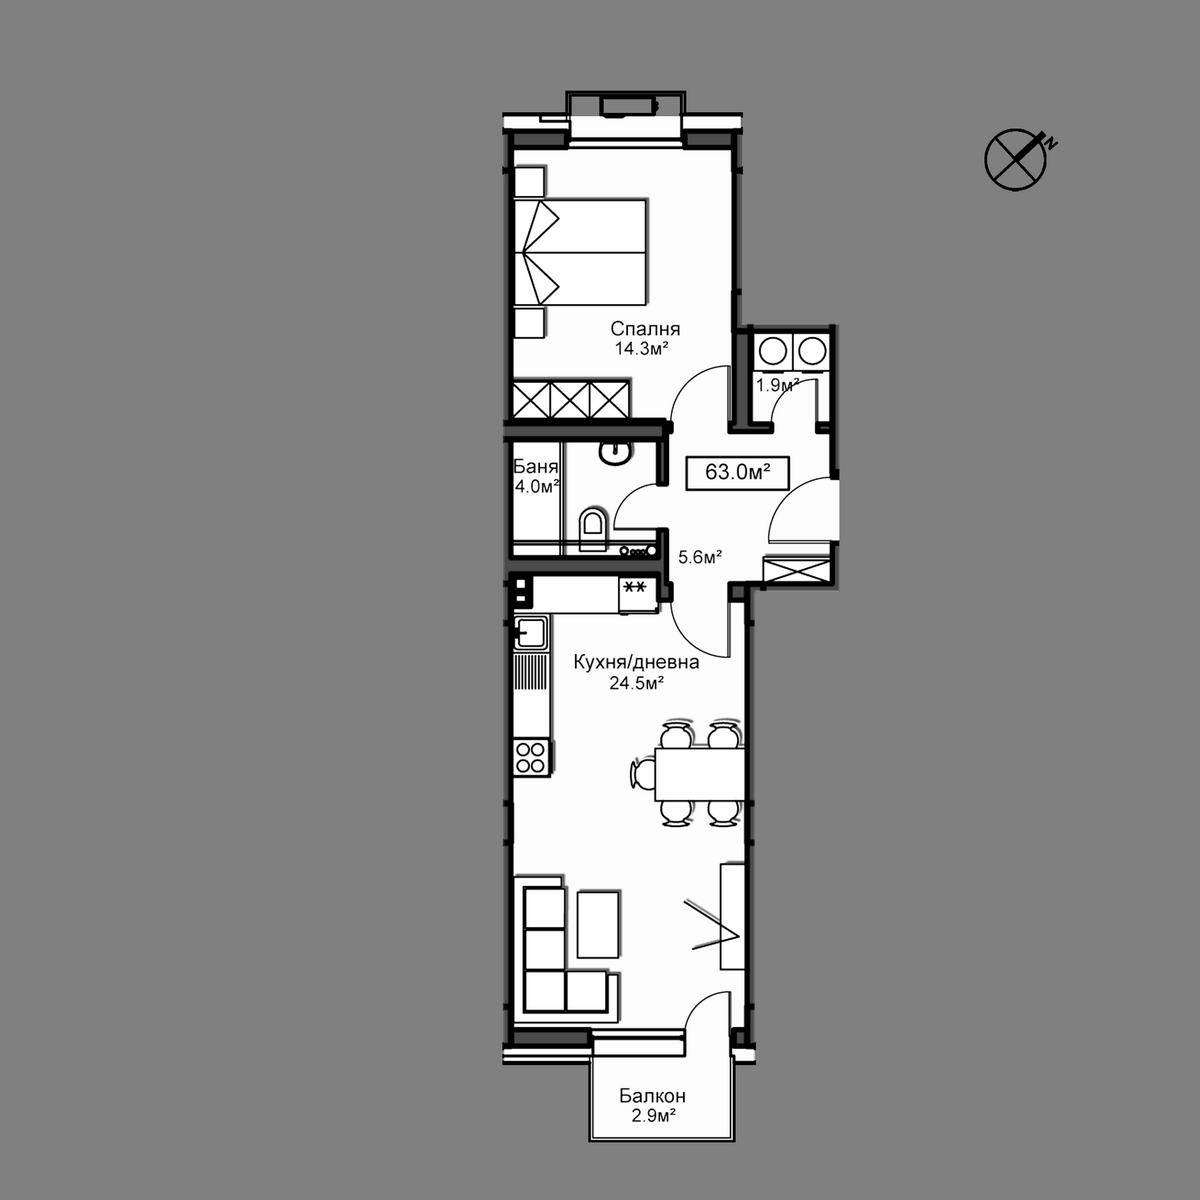 Продава апартамент ново строителство - Апартамент Б1